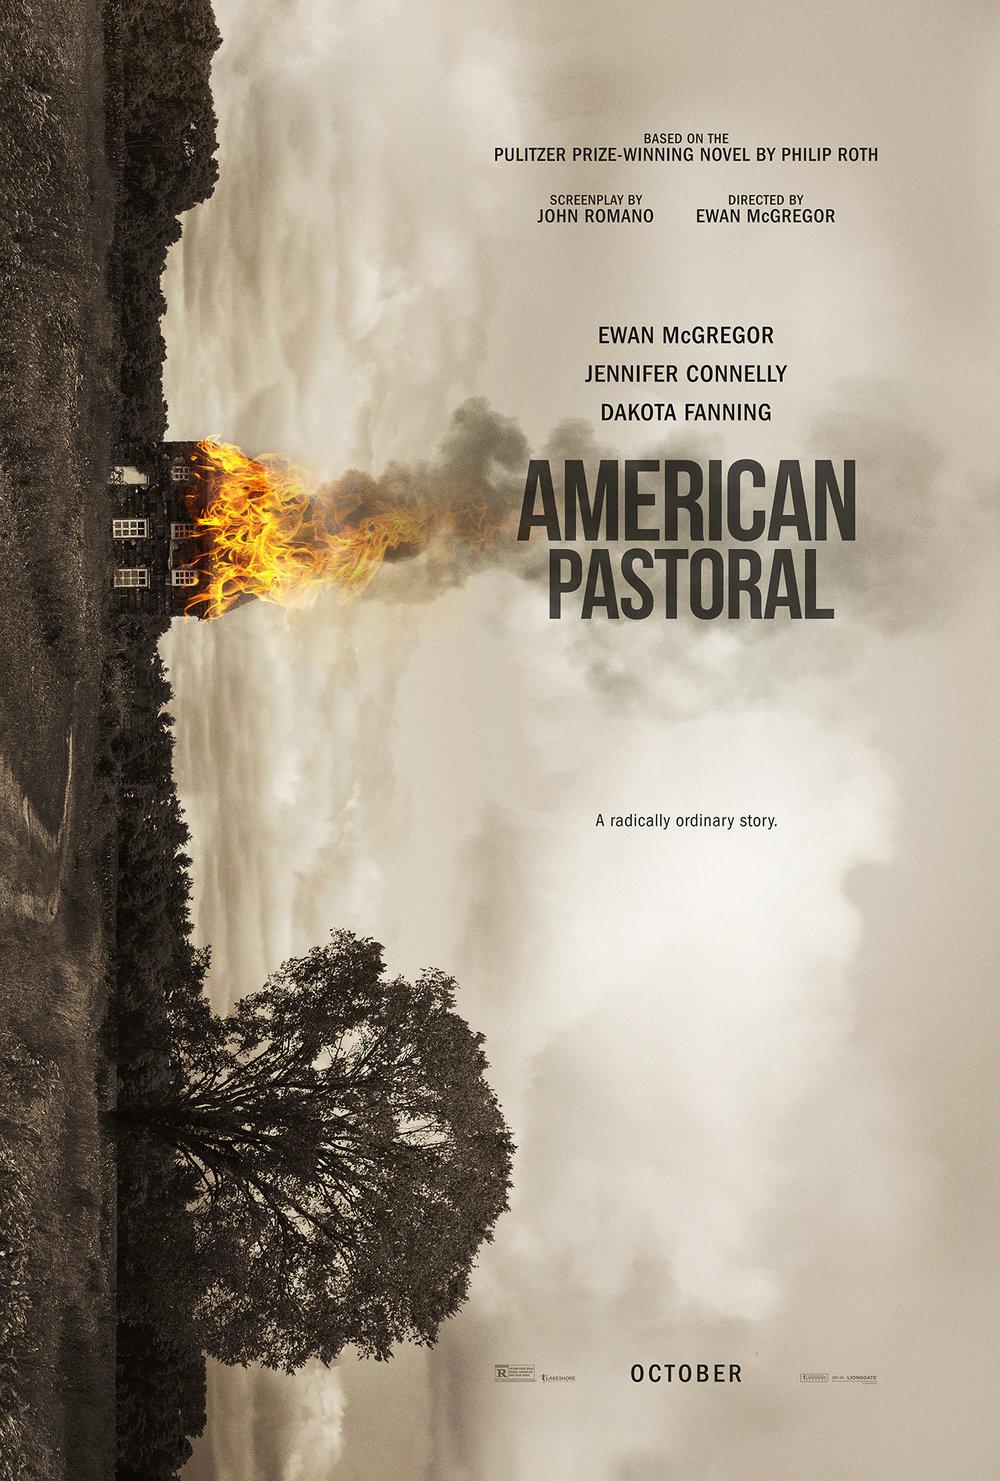 AmericanPastoral_Teaser_Trim_100dpi.jpg